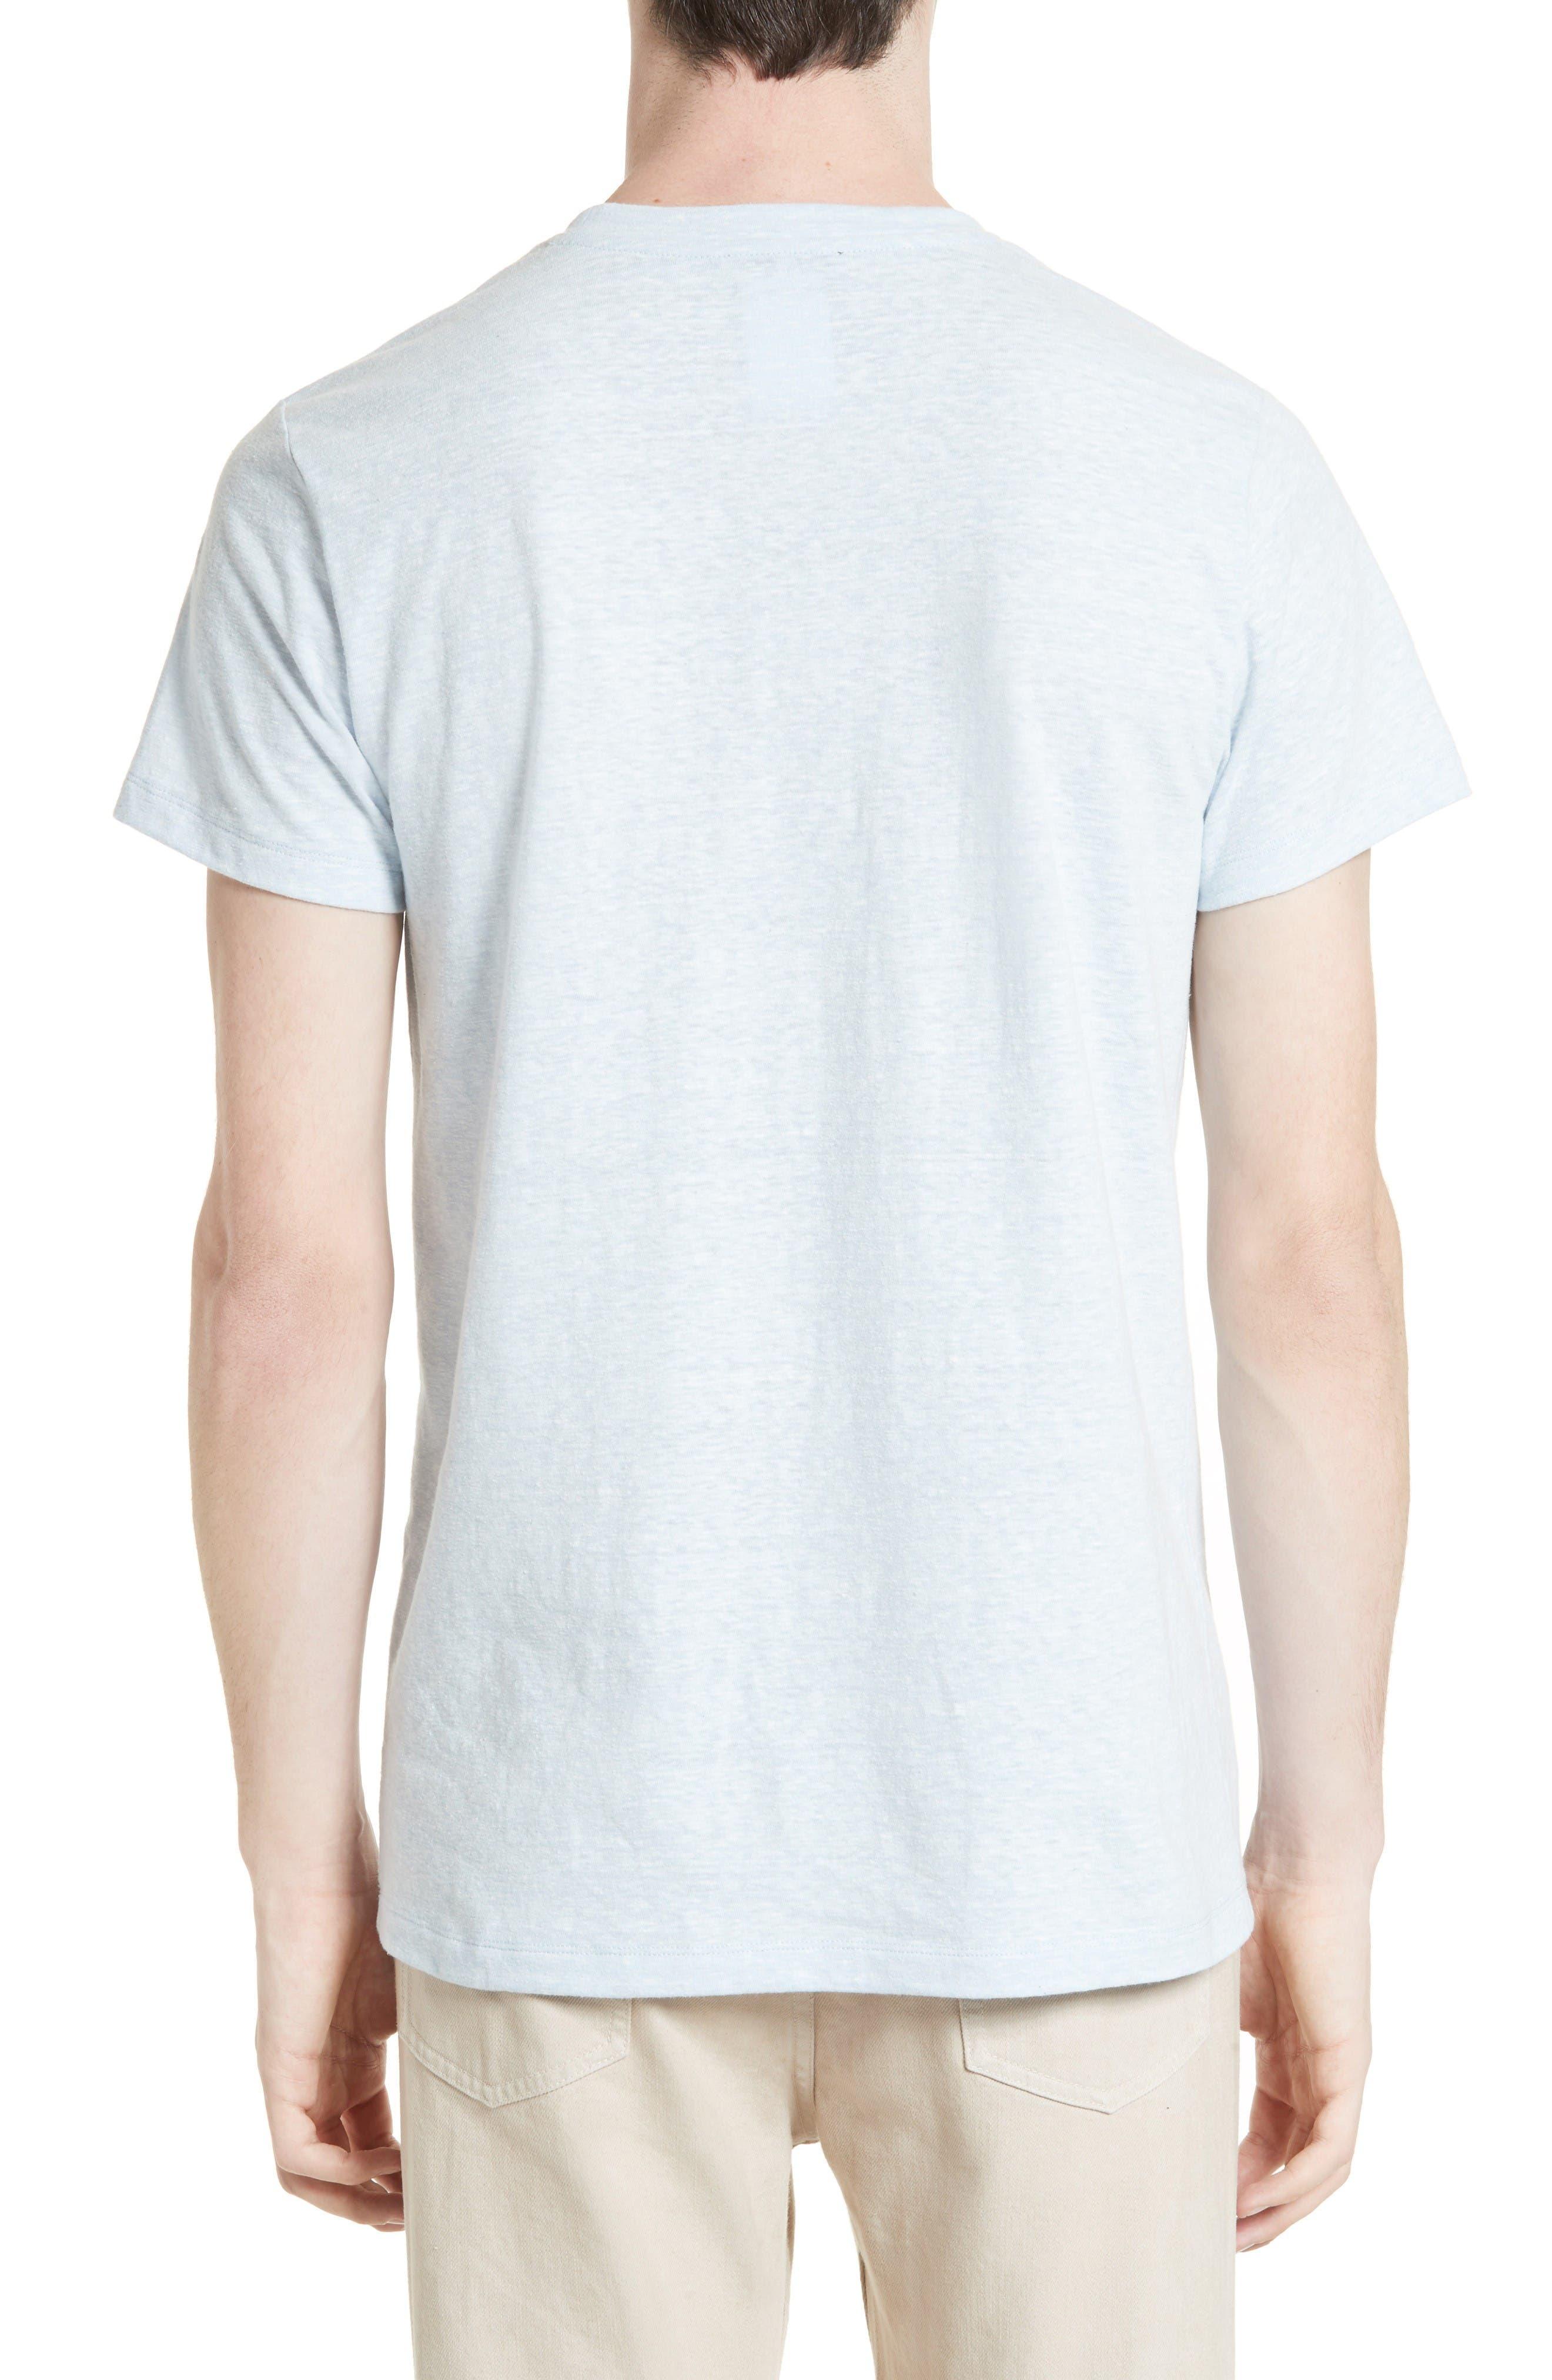 Jimmy T-Shirt,                             Alternate thumbnail 2, color,                             Blue